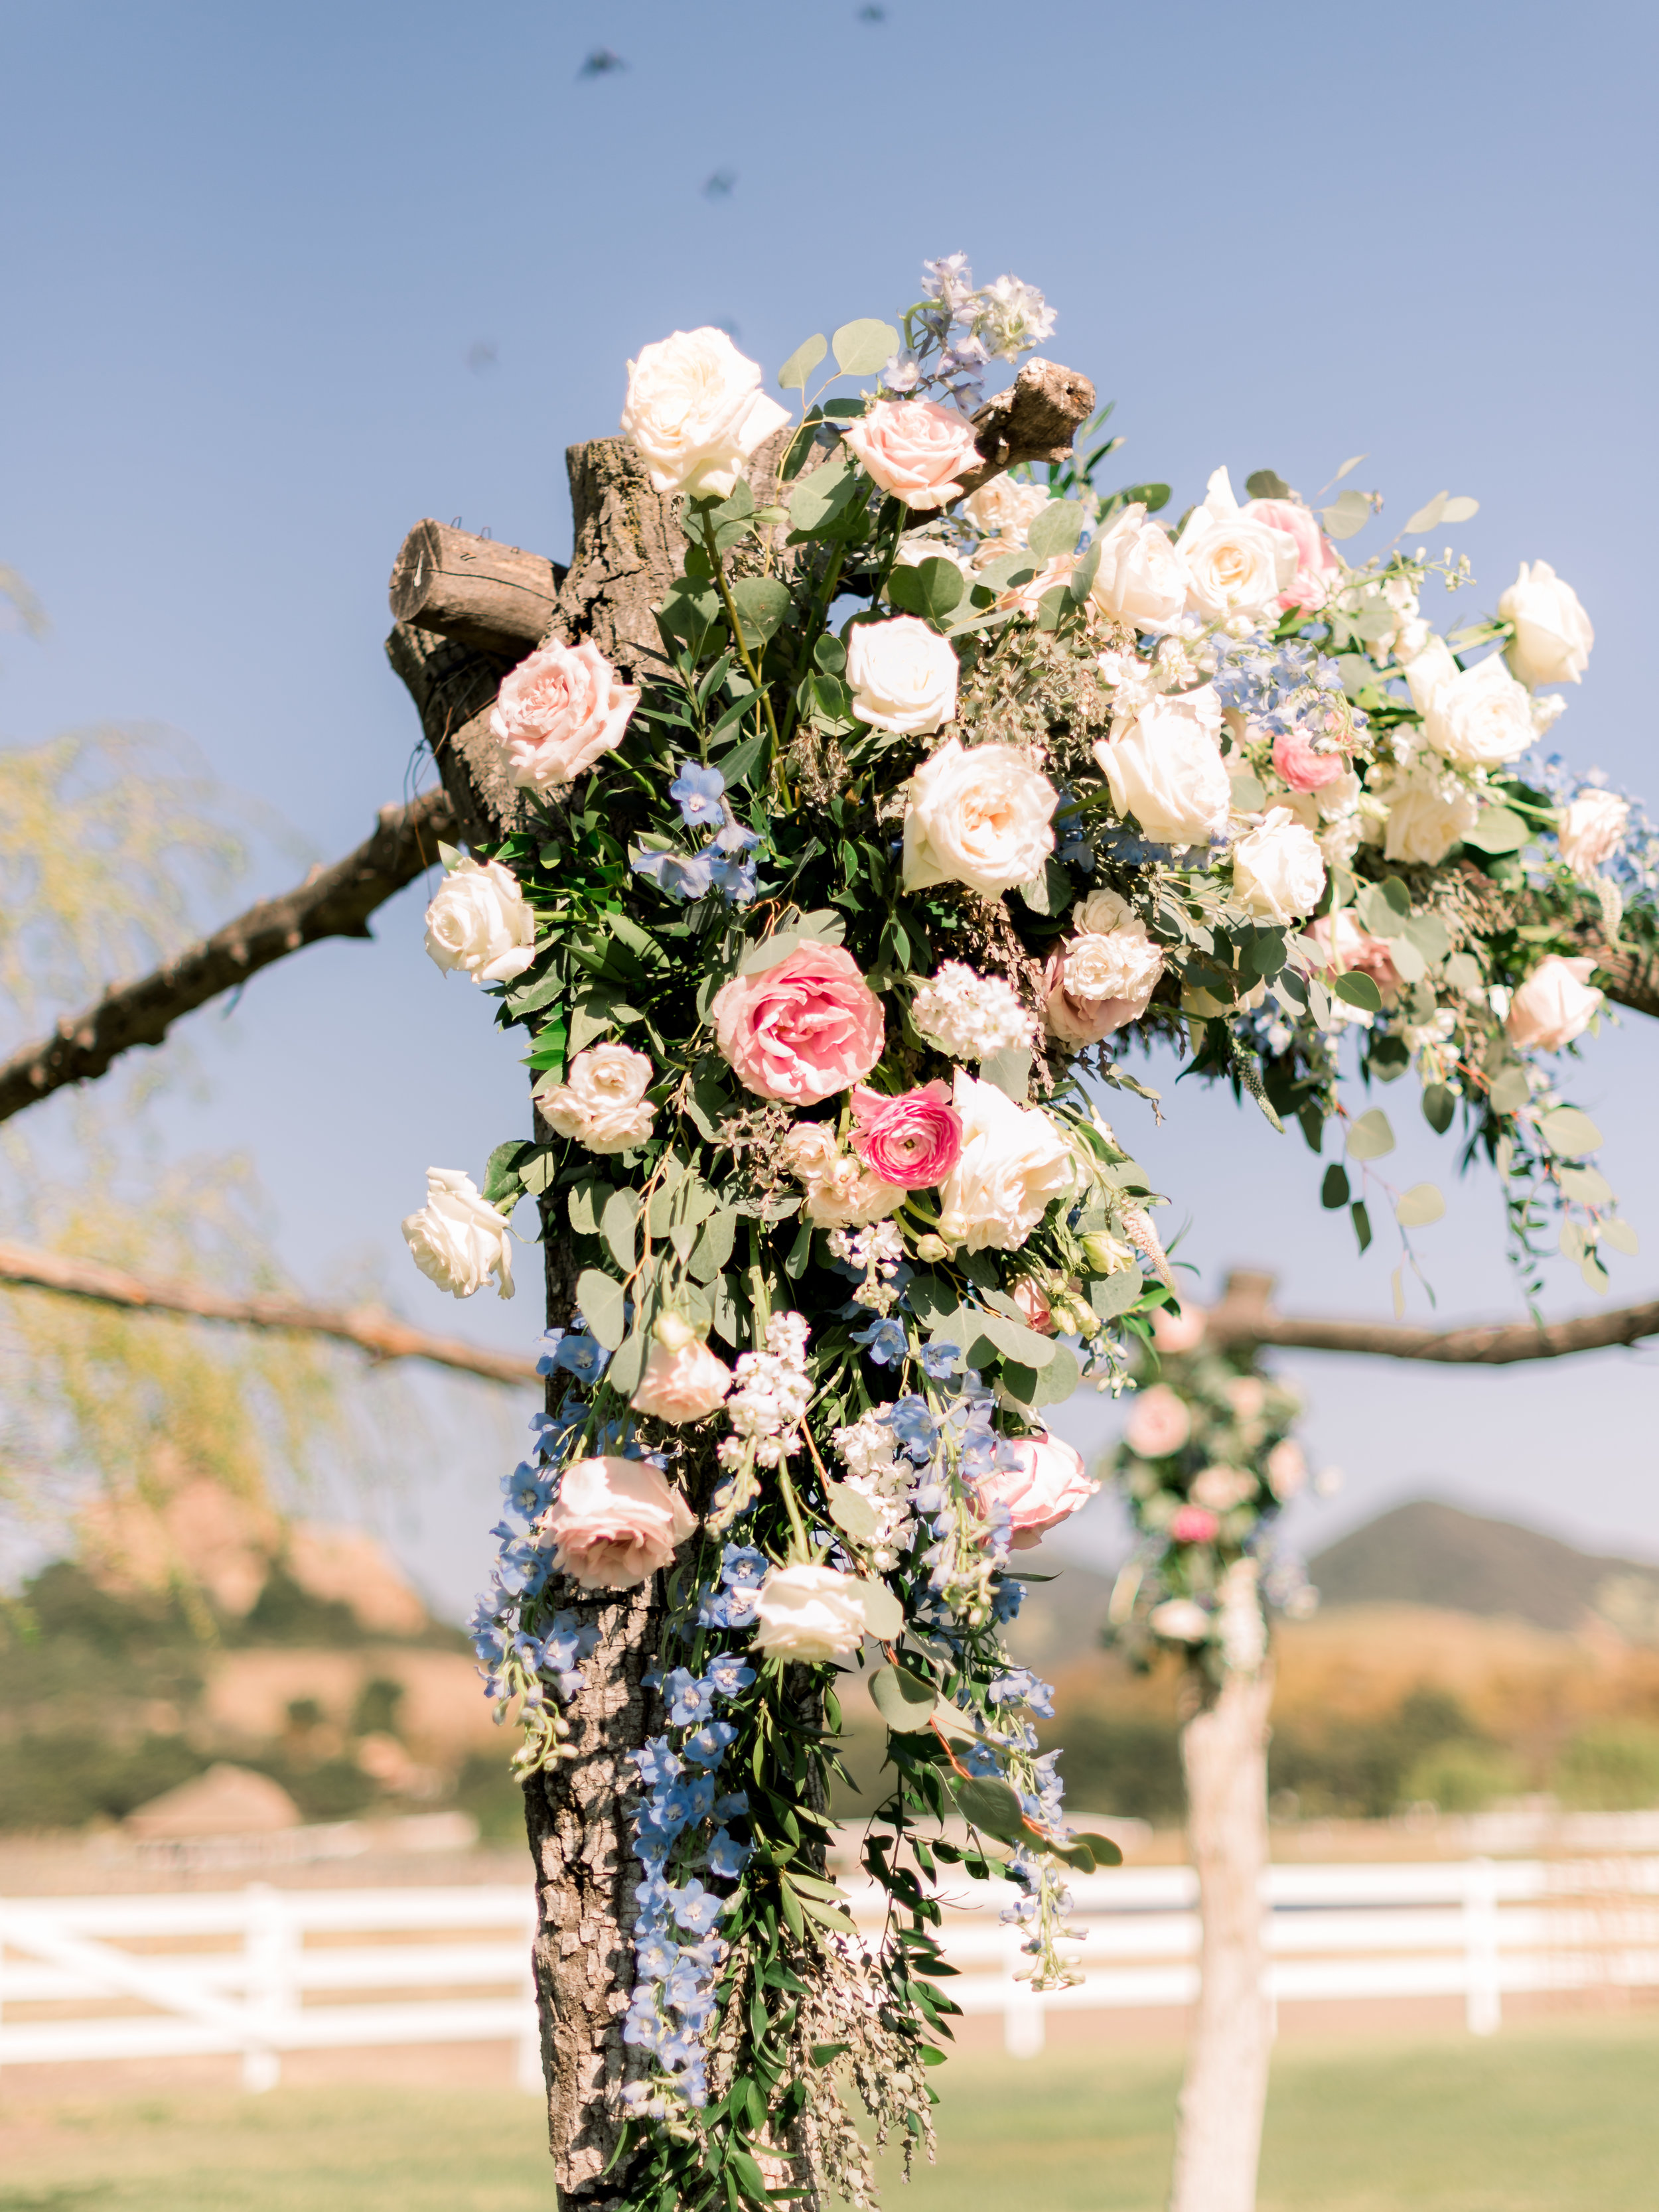 wedding-altar-draped-with-flowers.jpg